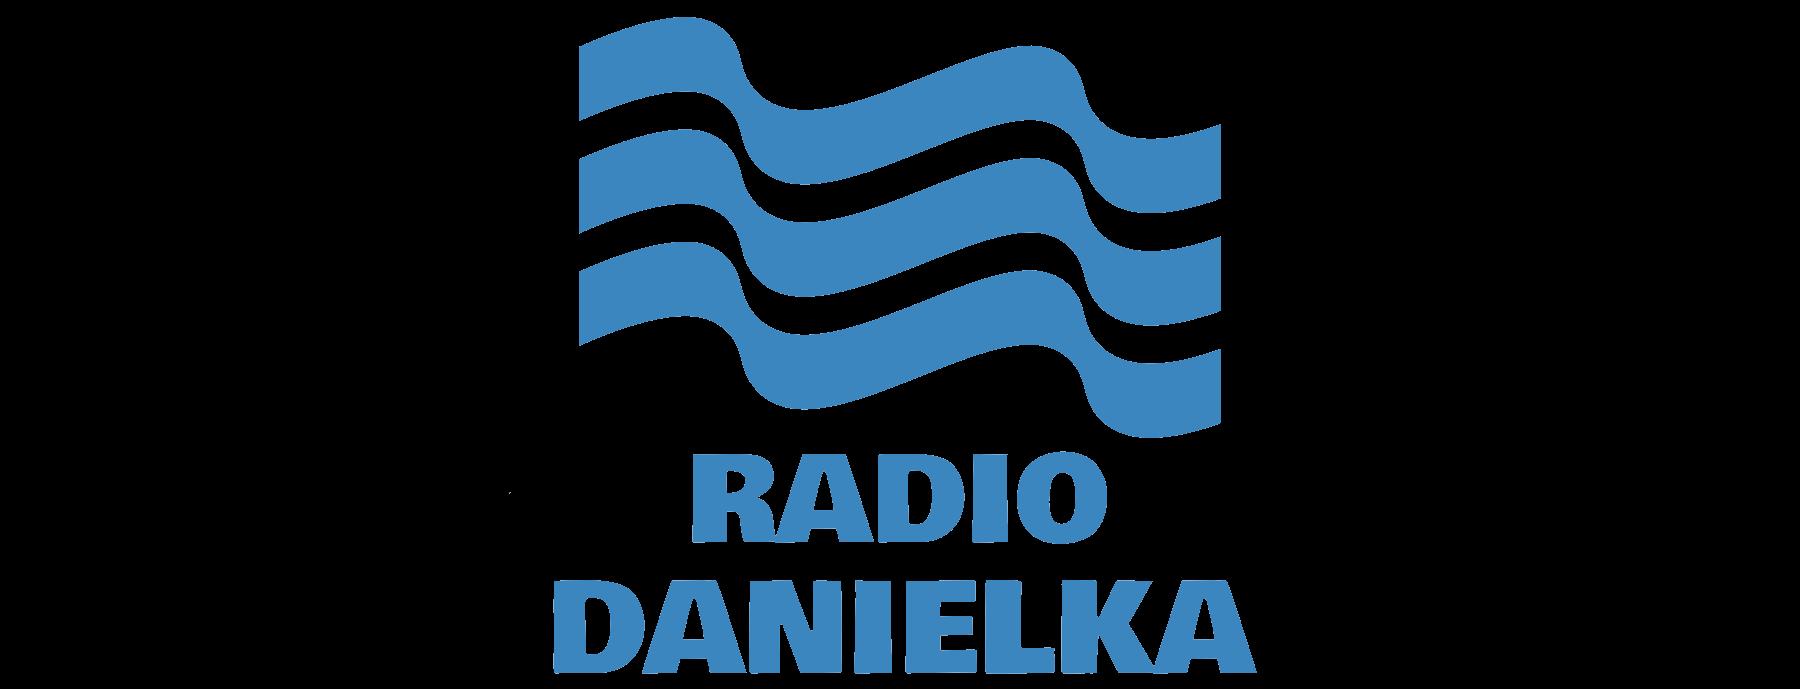 Logo for Radio Danielka